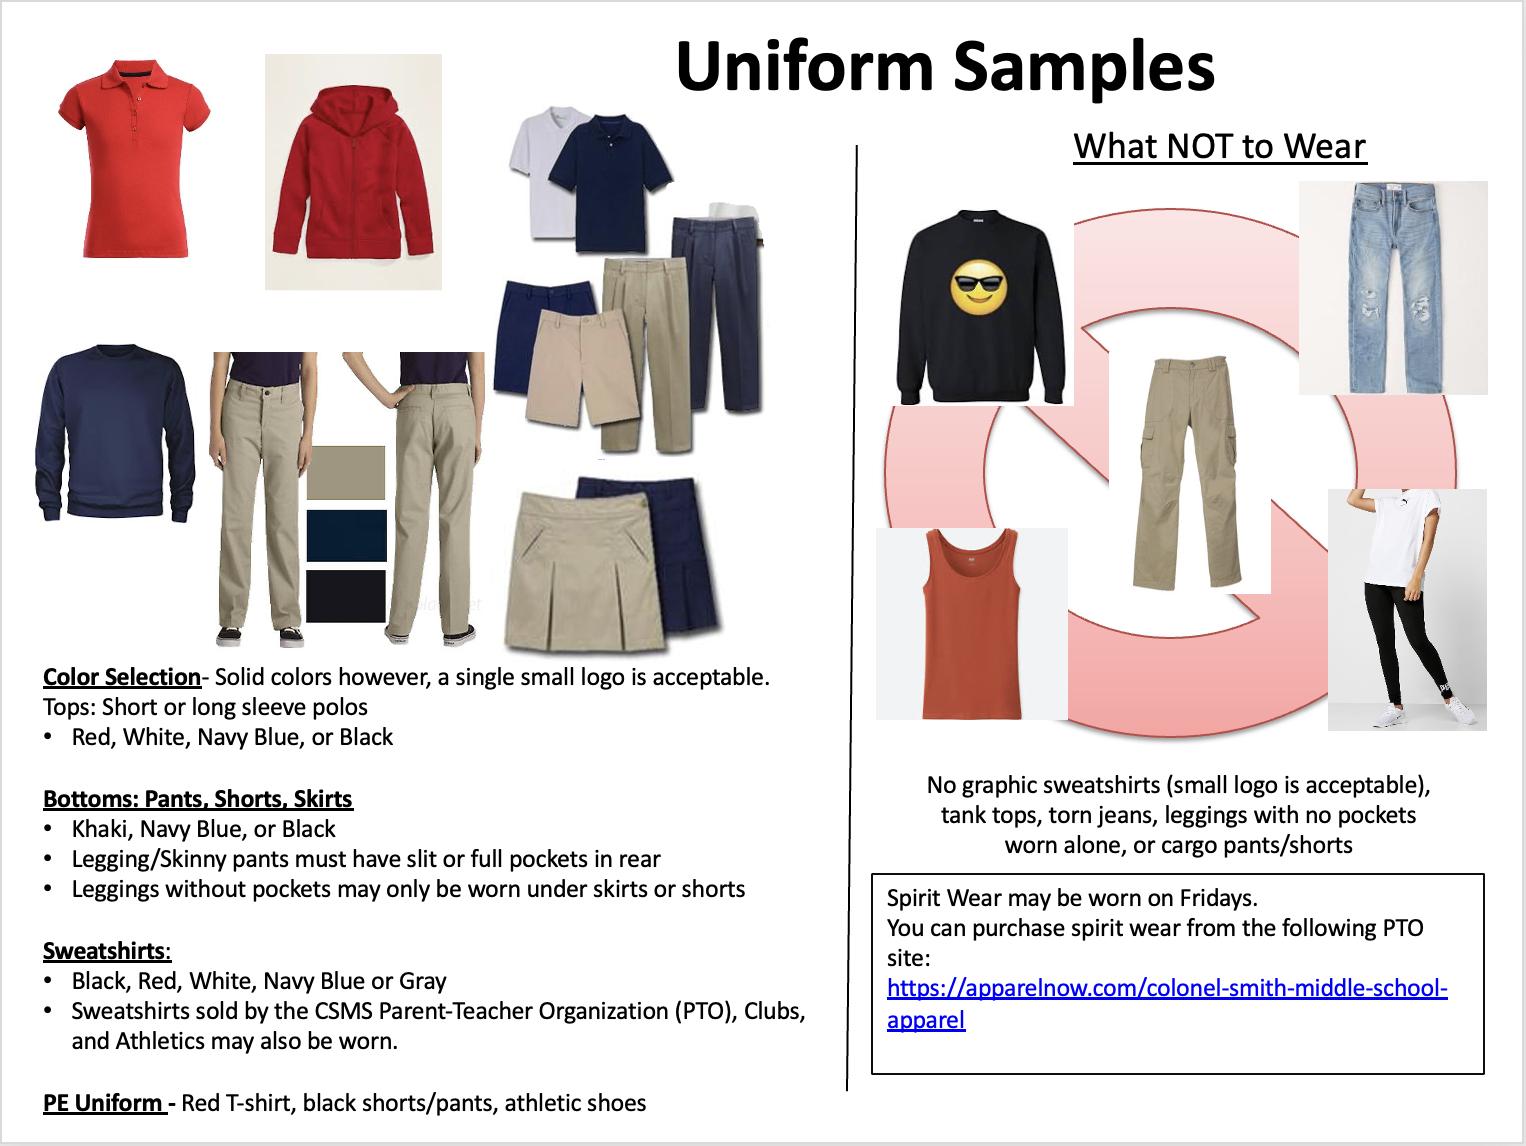 Sample Uniforms